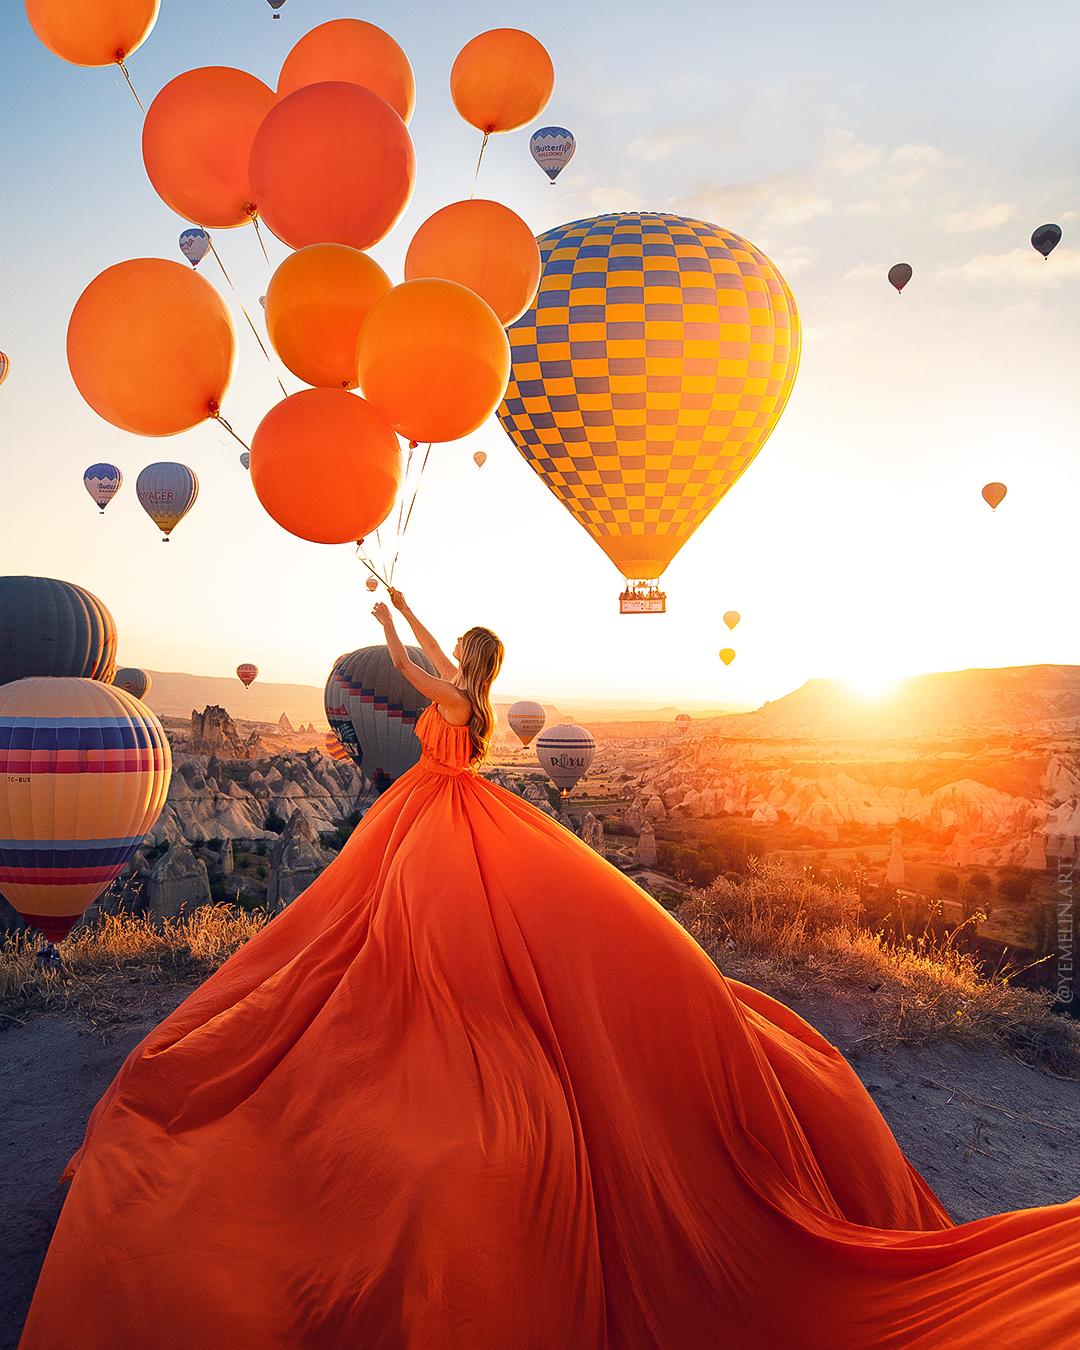 Big Balloons Cappadocia   Balloons photography, Fairytale photography,  Photoshoot poses